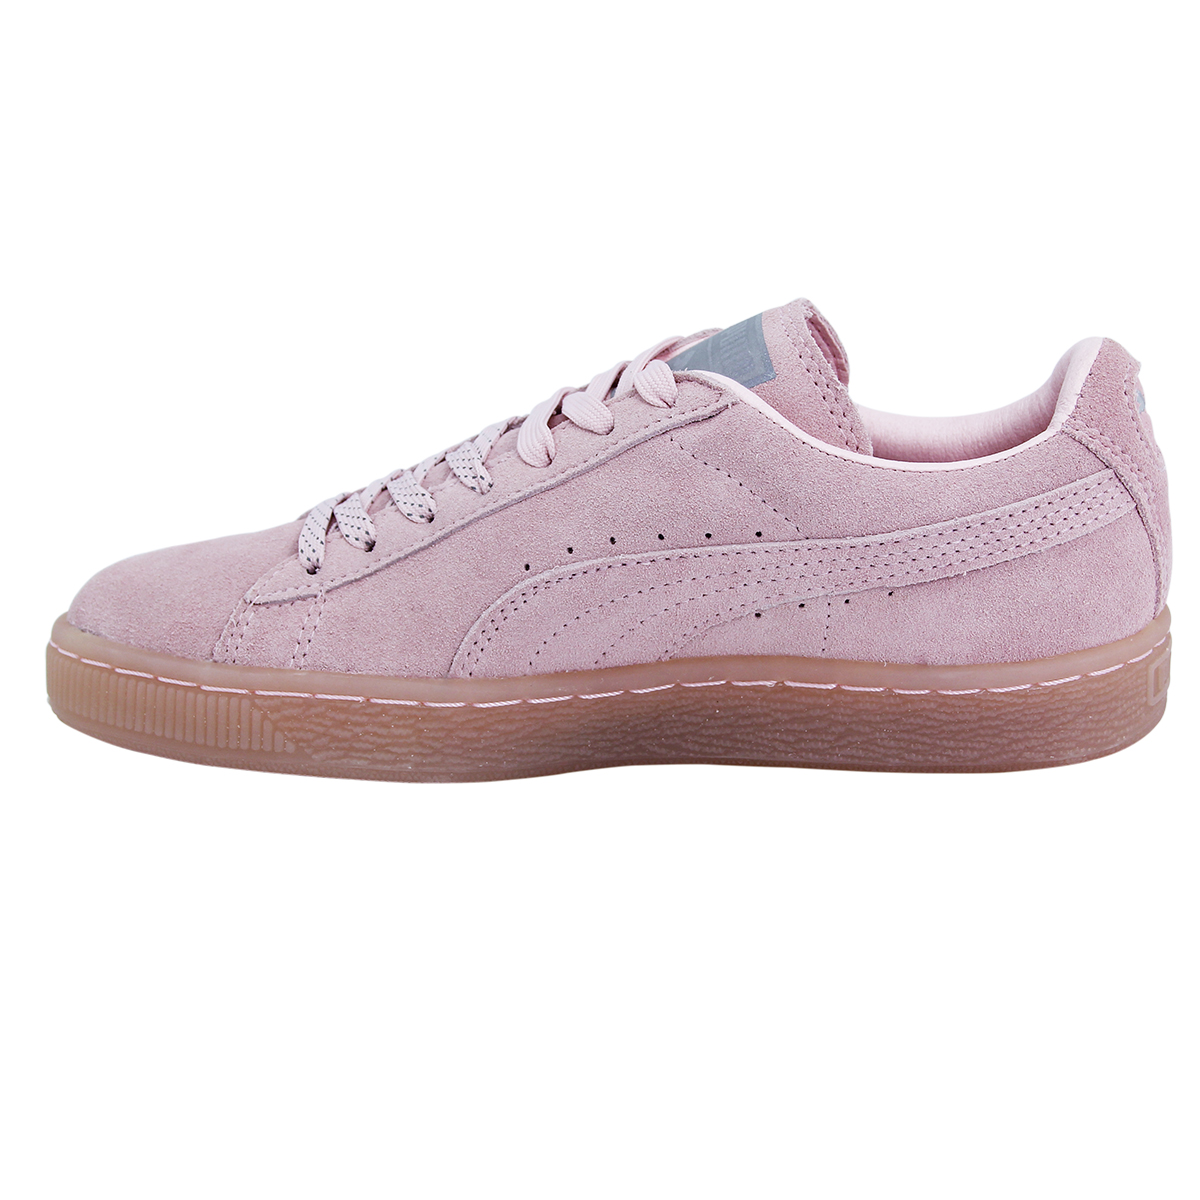 Puma Puma Puma SNA Daim Mono en Cuir et Daim Femmes Baskets Chaussures Ortholite 9c0224